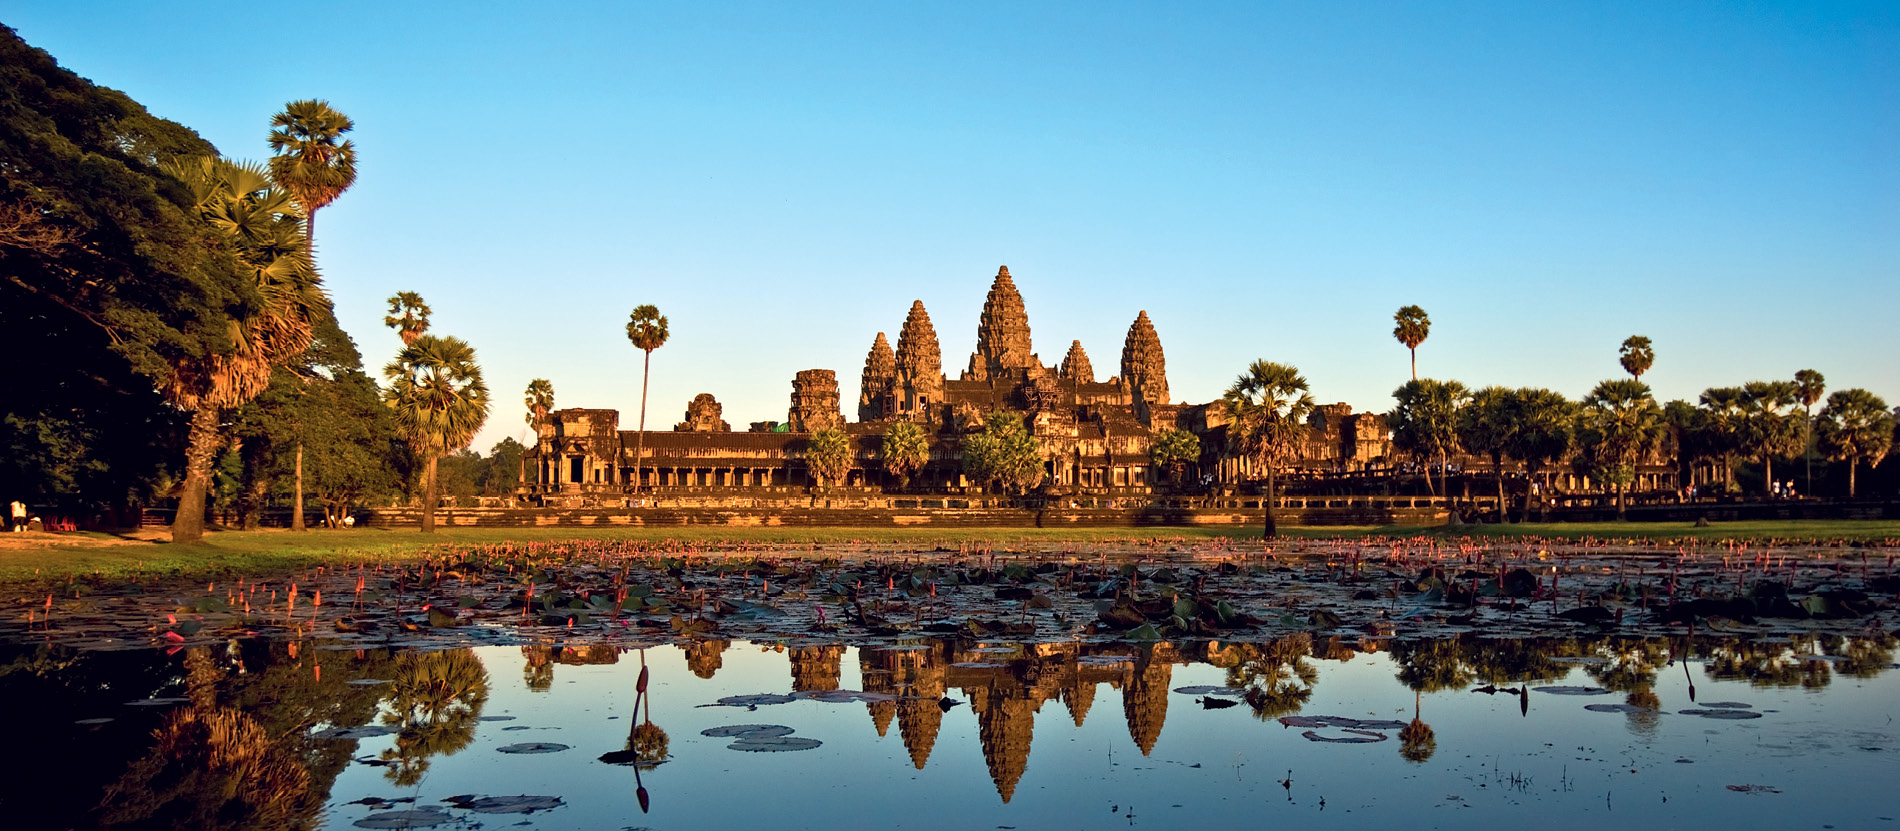 Kambodzsa - Laosz - Vietnam körutazás